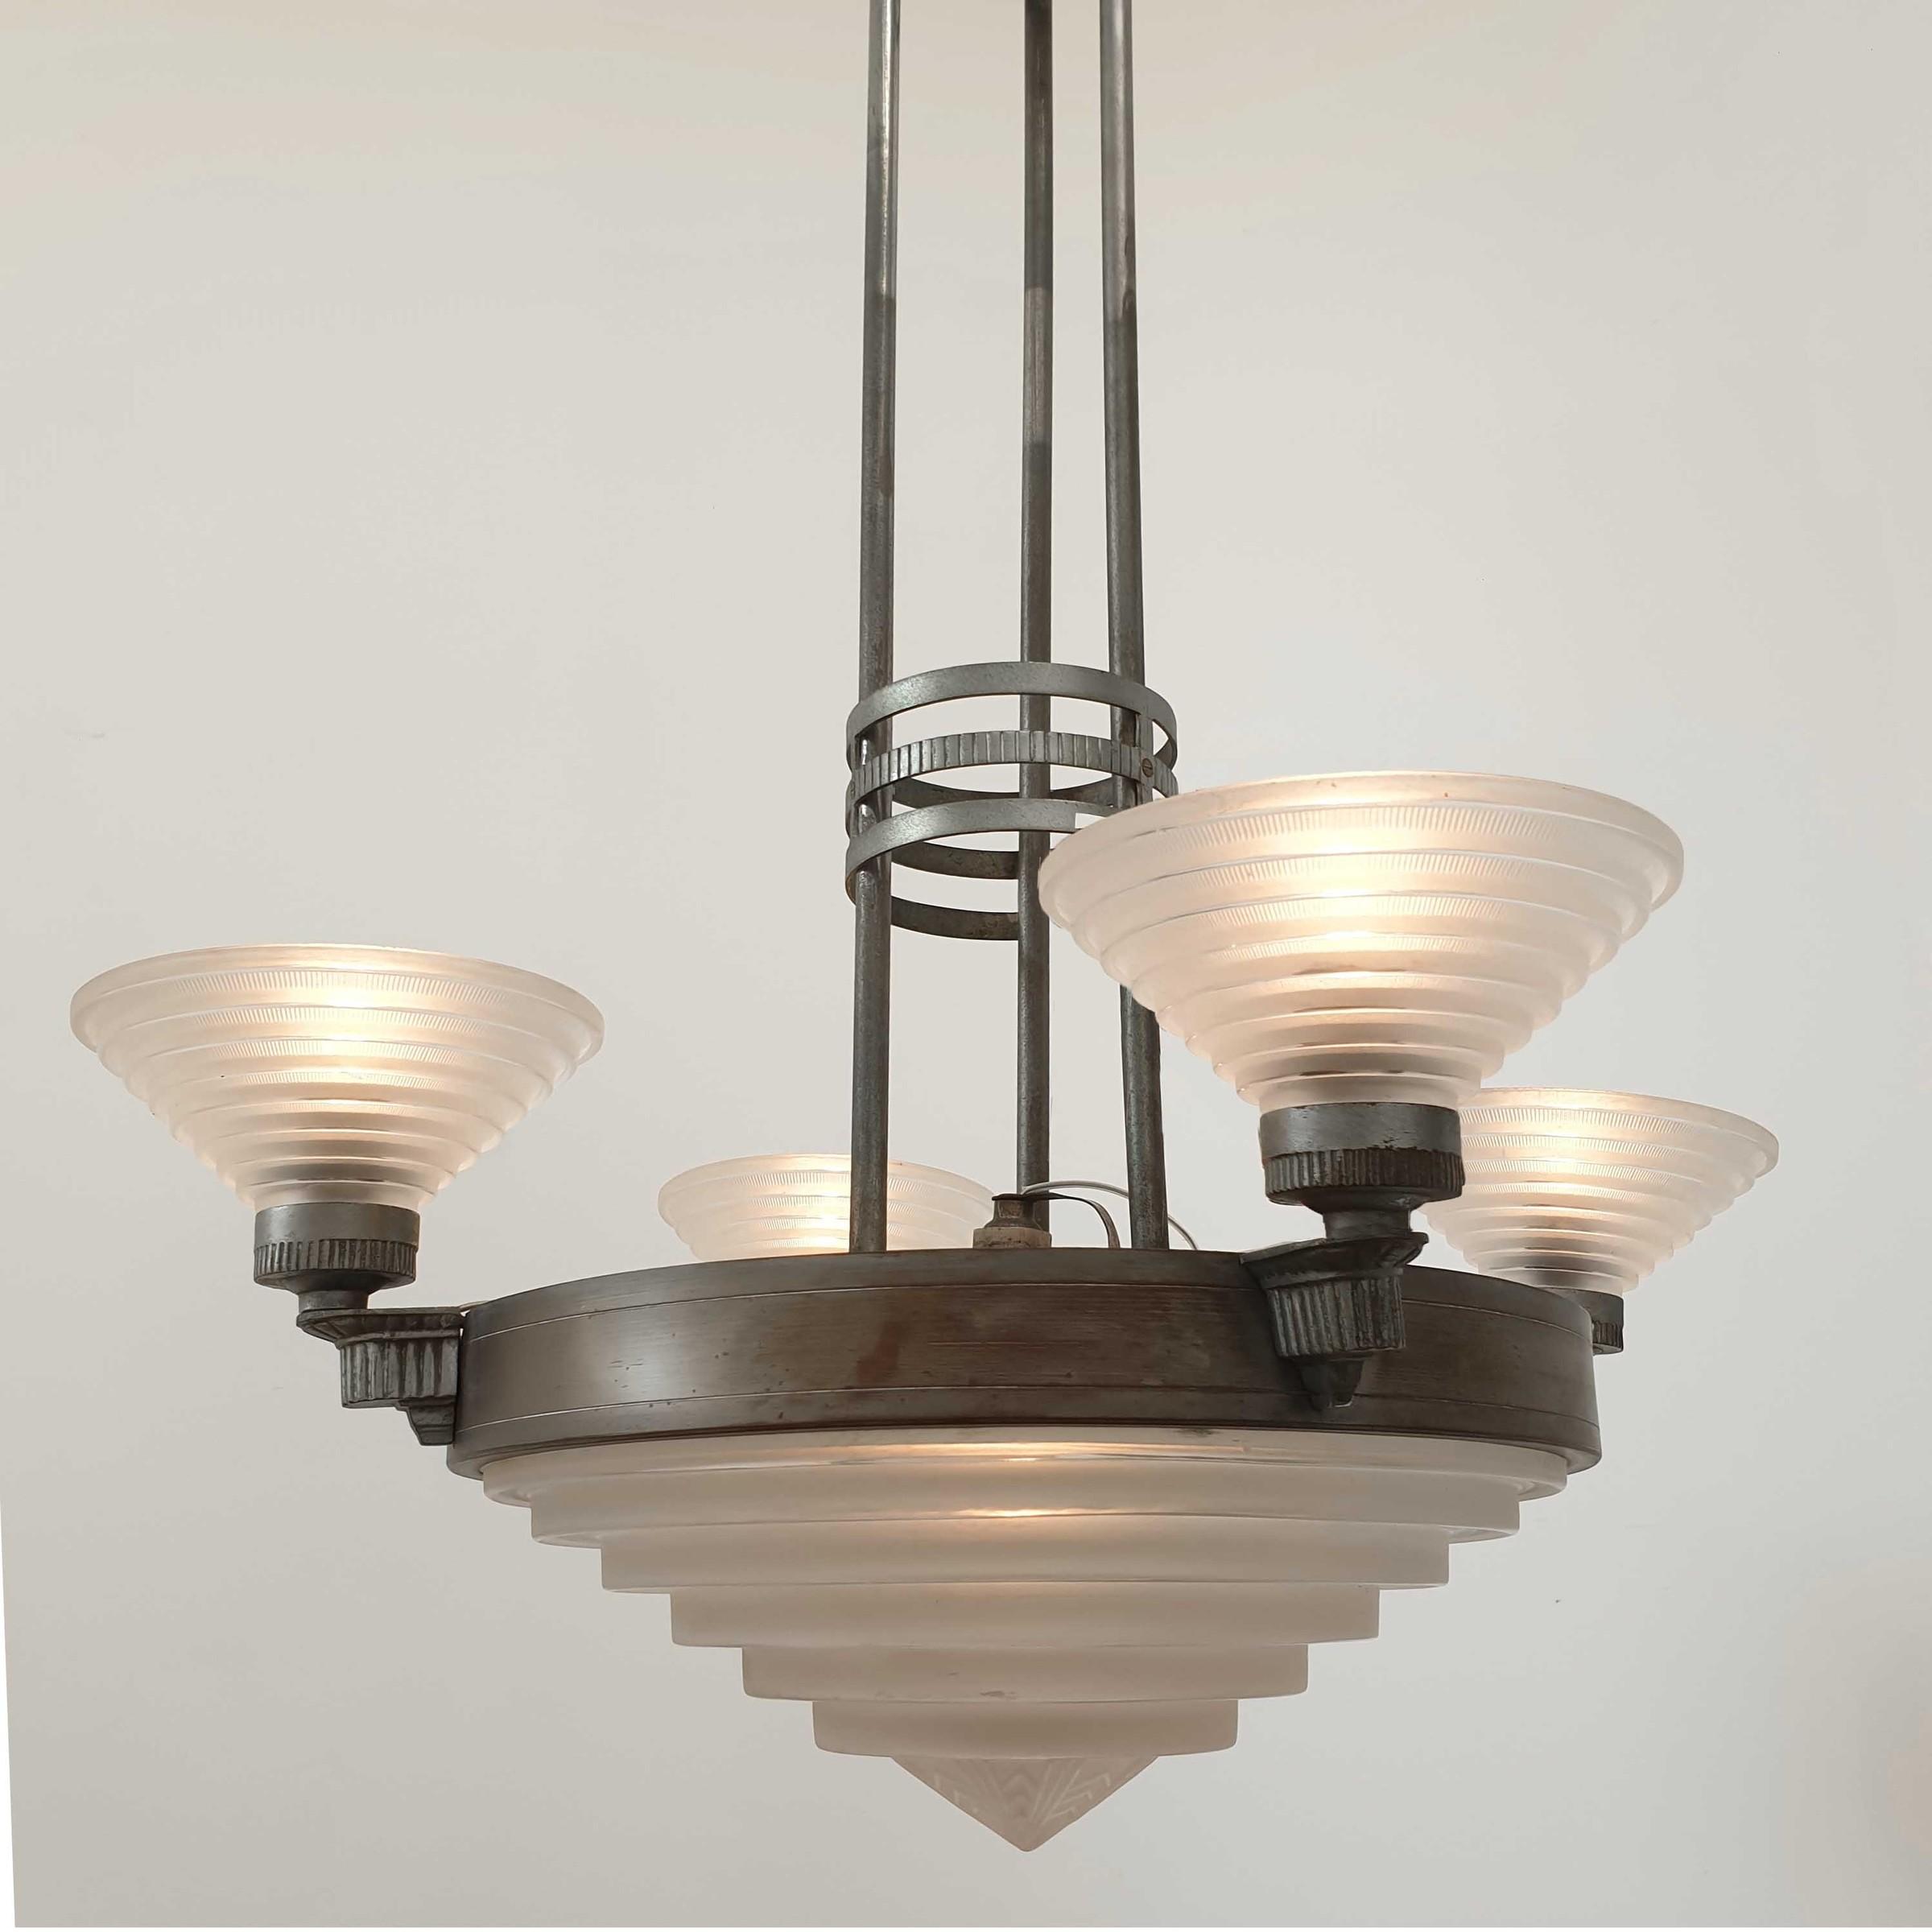 Art deco hanging lamp by Jules Leleu